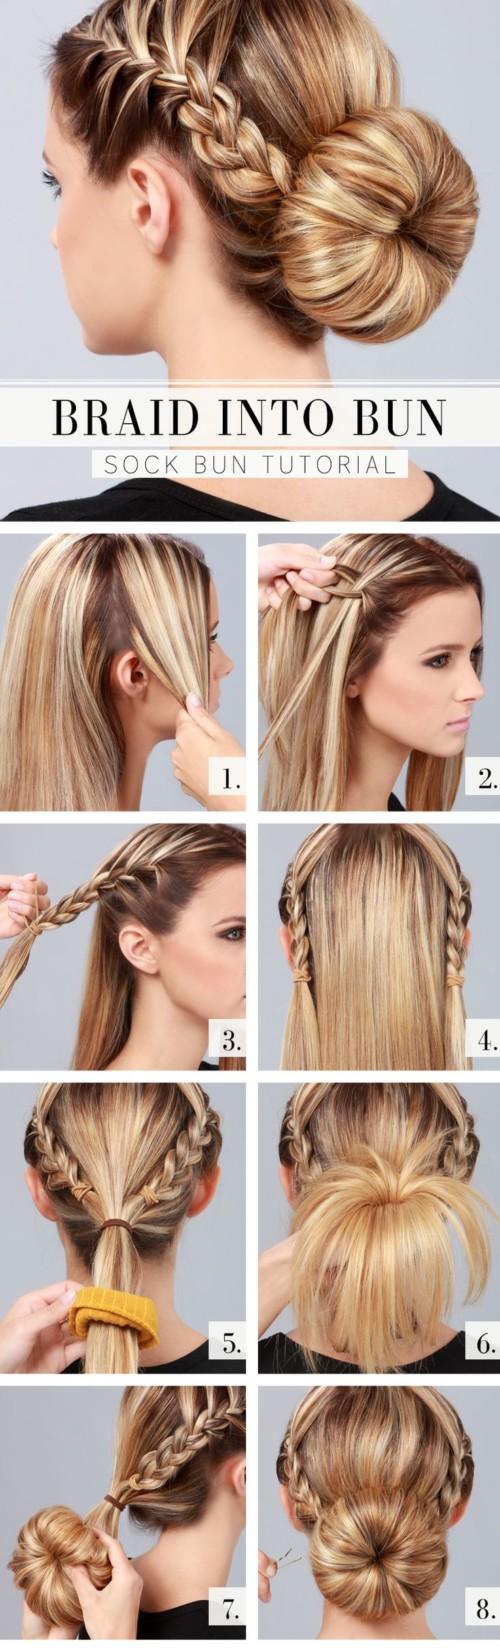 Elegantes-Peinados-para-Fiestas-6